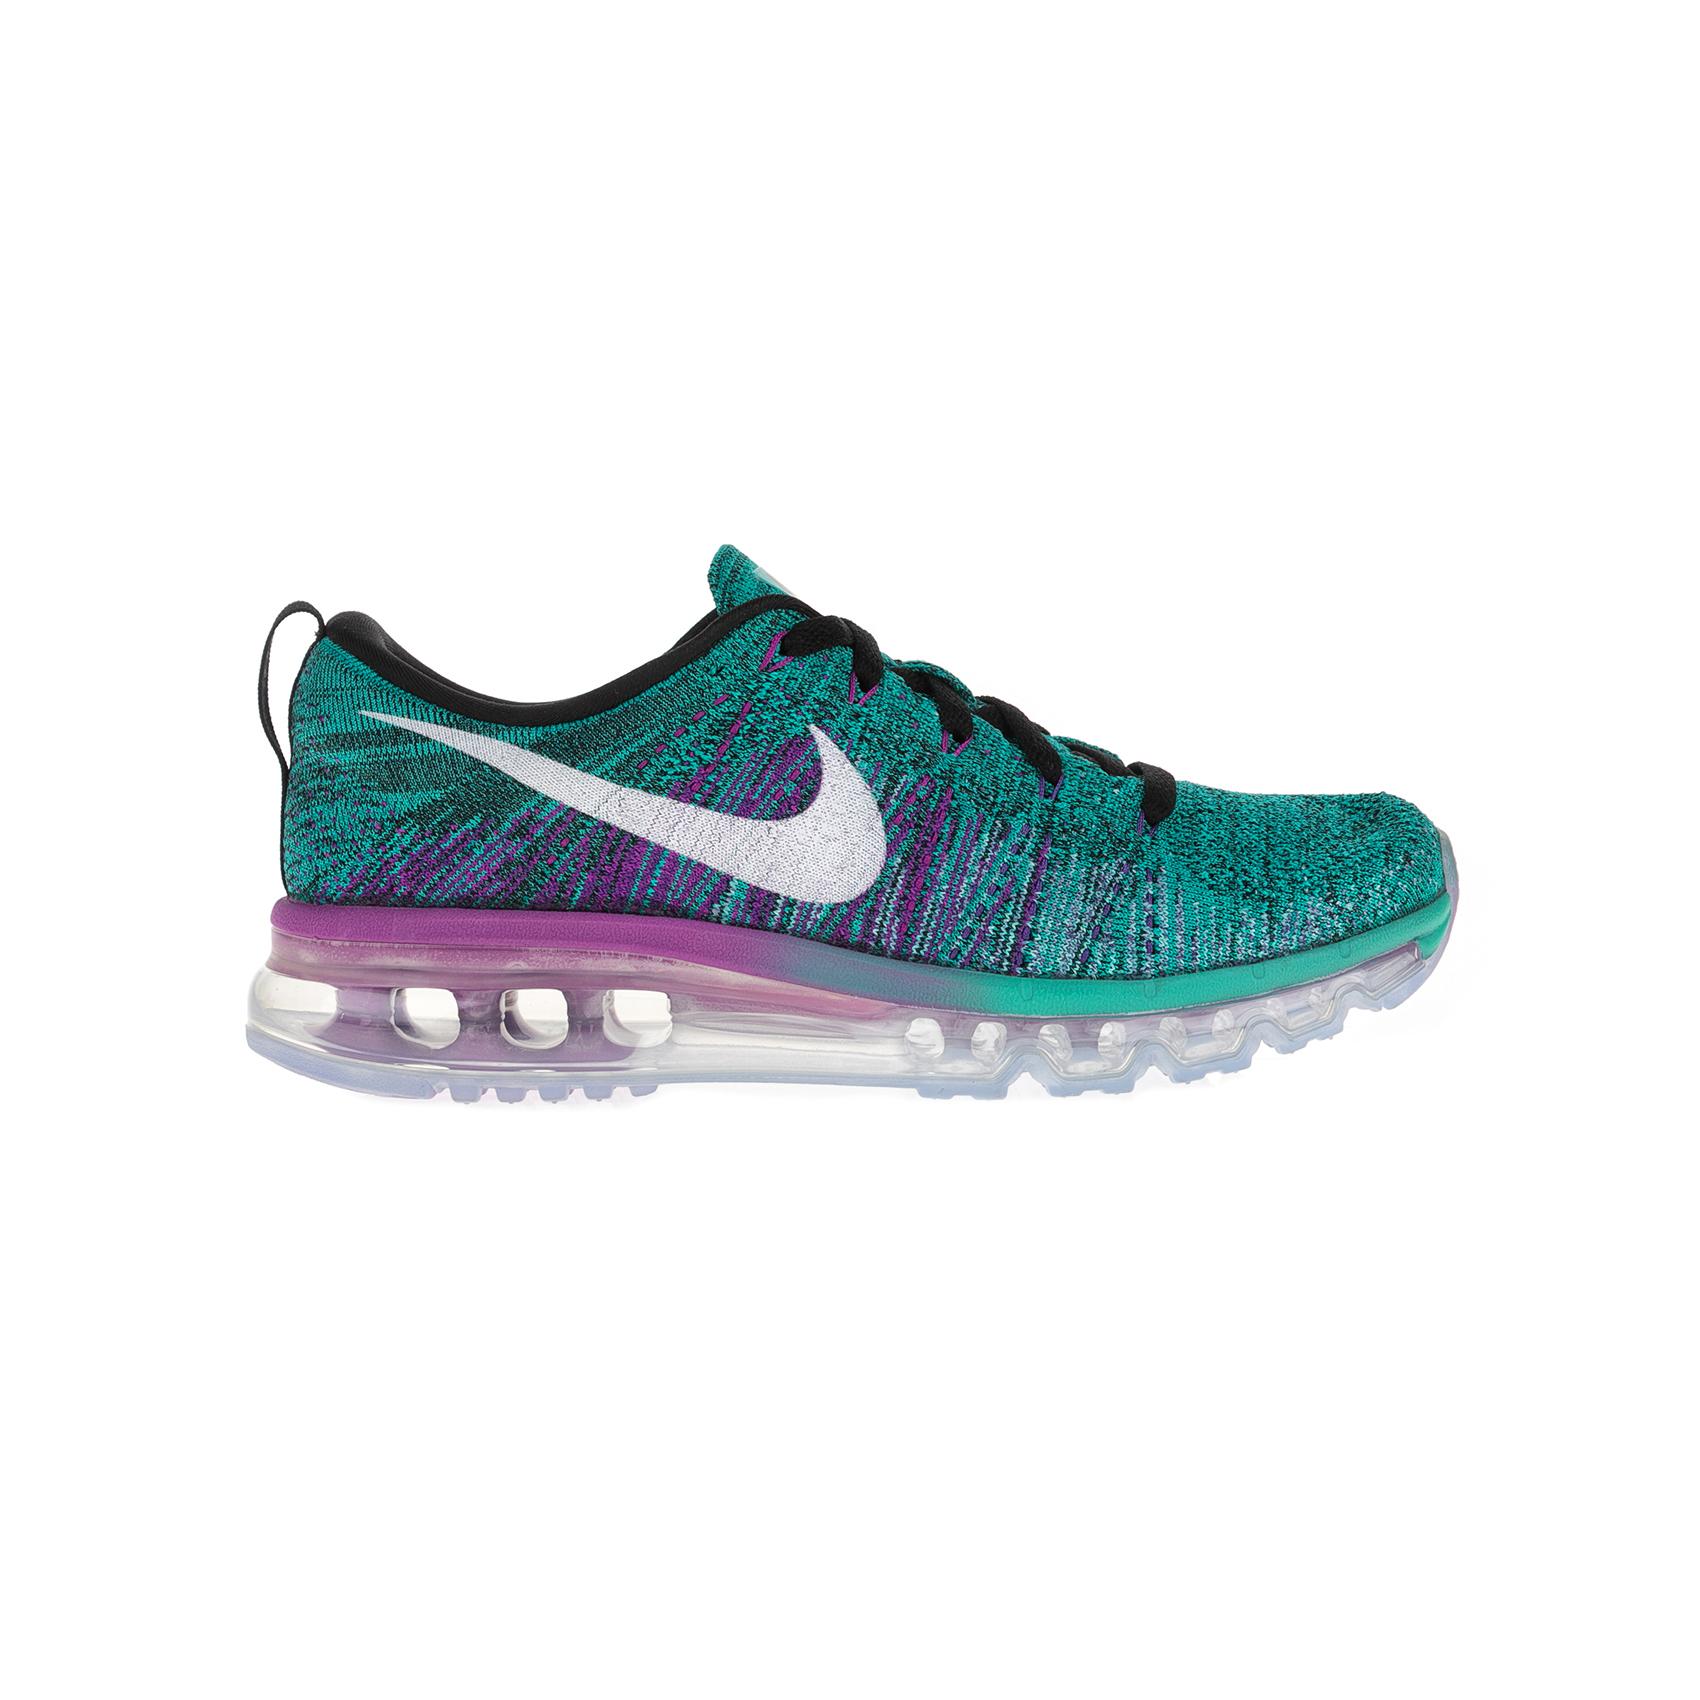 NIKE - Γυναικεία παπούτσια NIKE ULTRA FLYKNIT MAX πράσινα-μοβ γυναικεία παπούτσια αθλητικά running